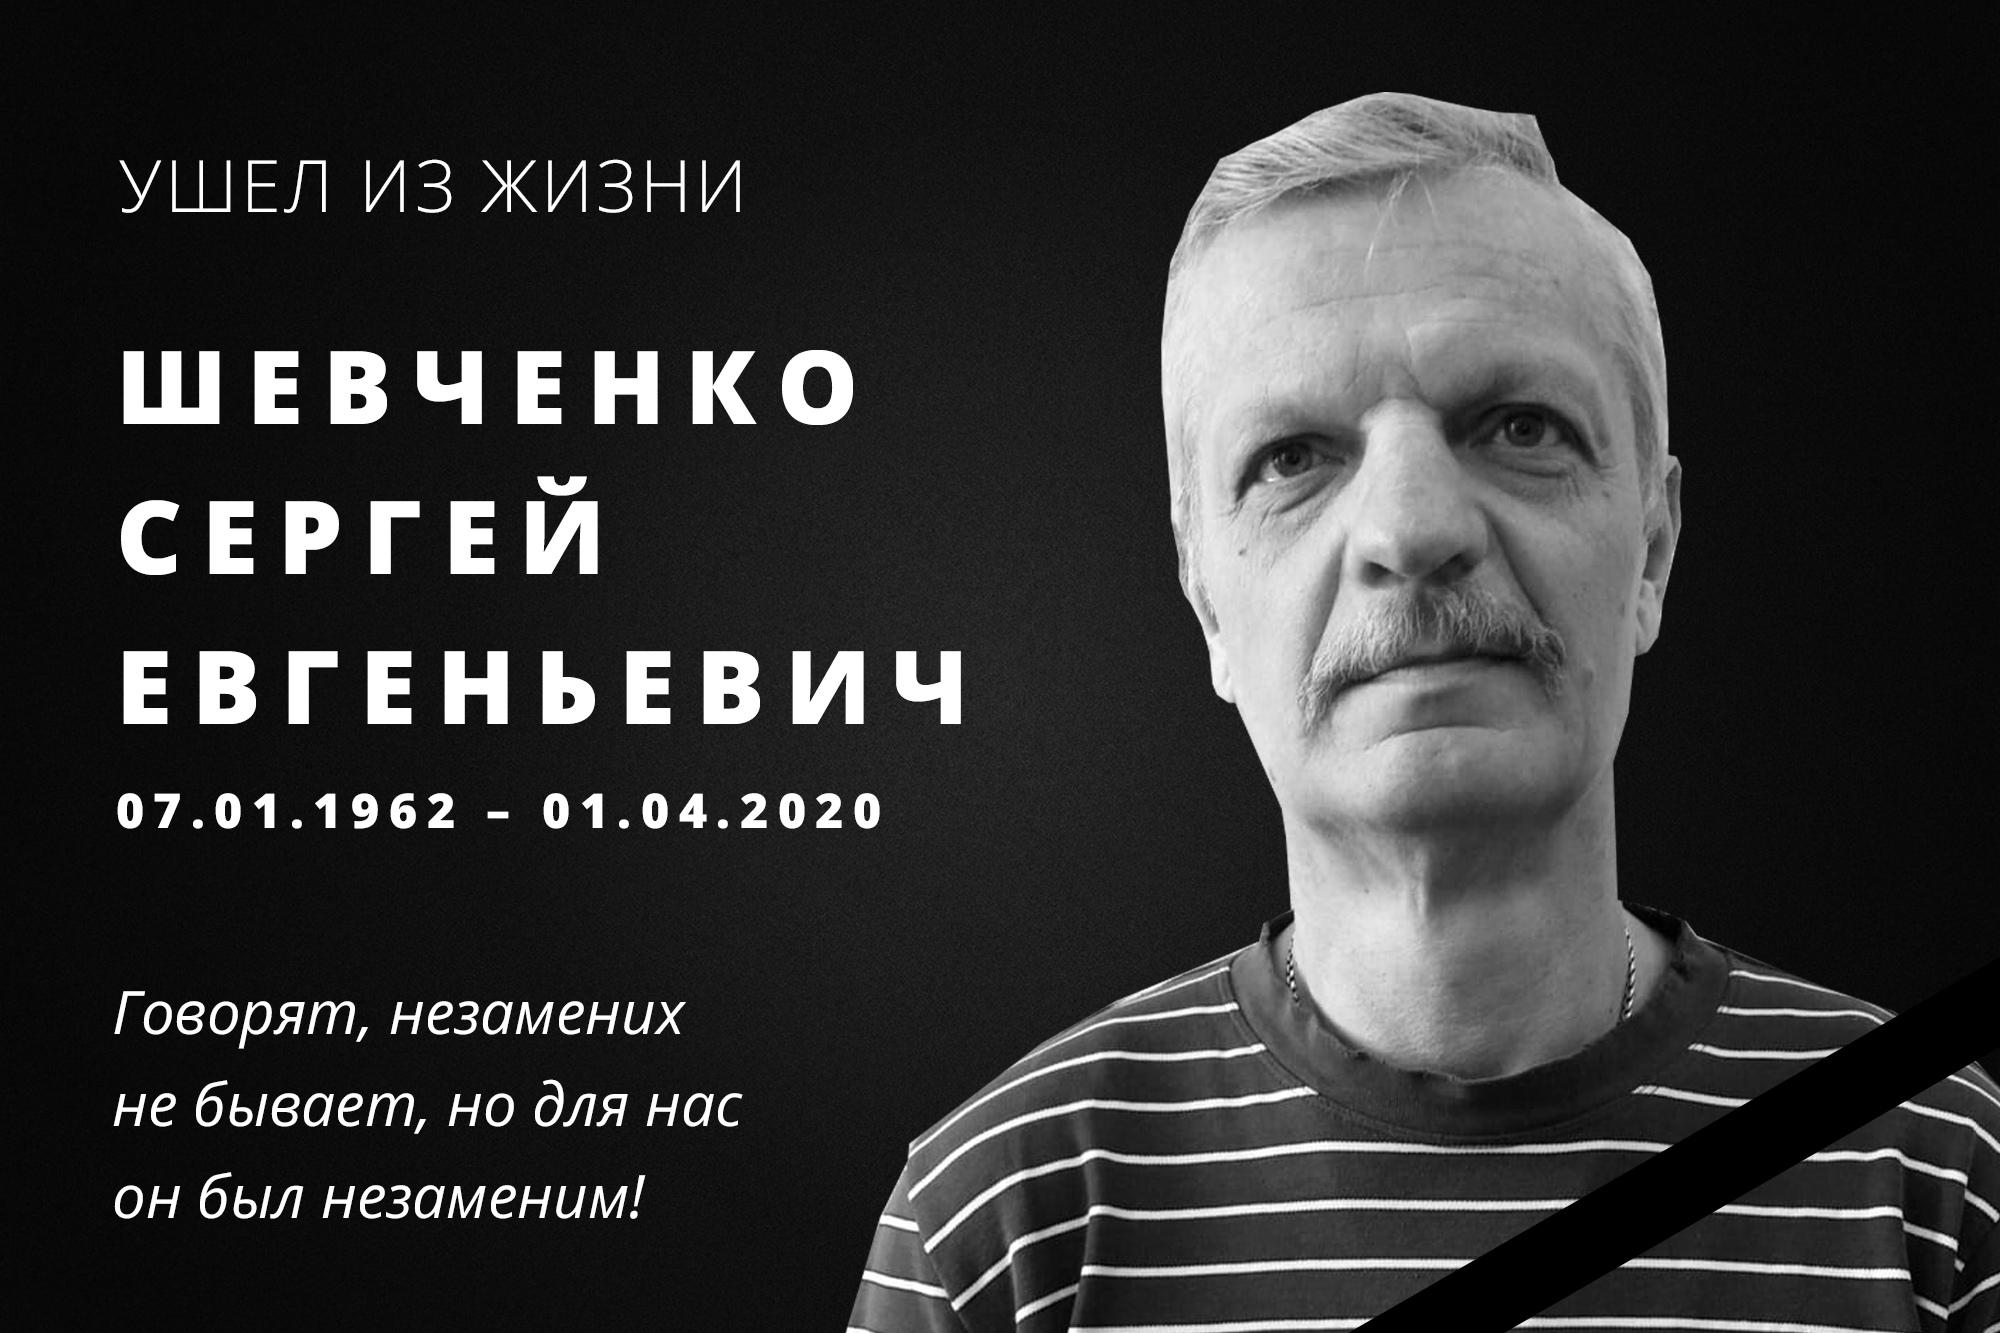 Умер Шевченко Сергей Евгеньевич